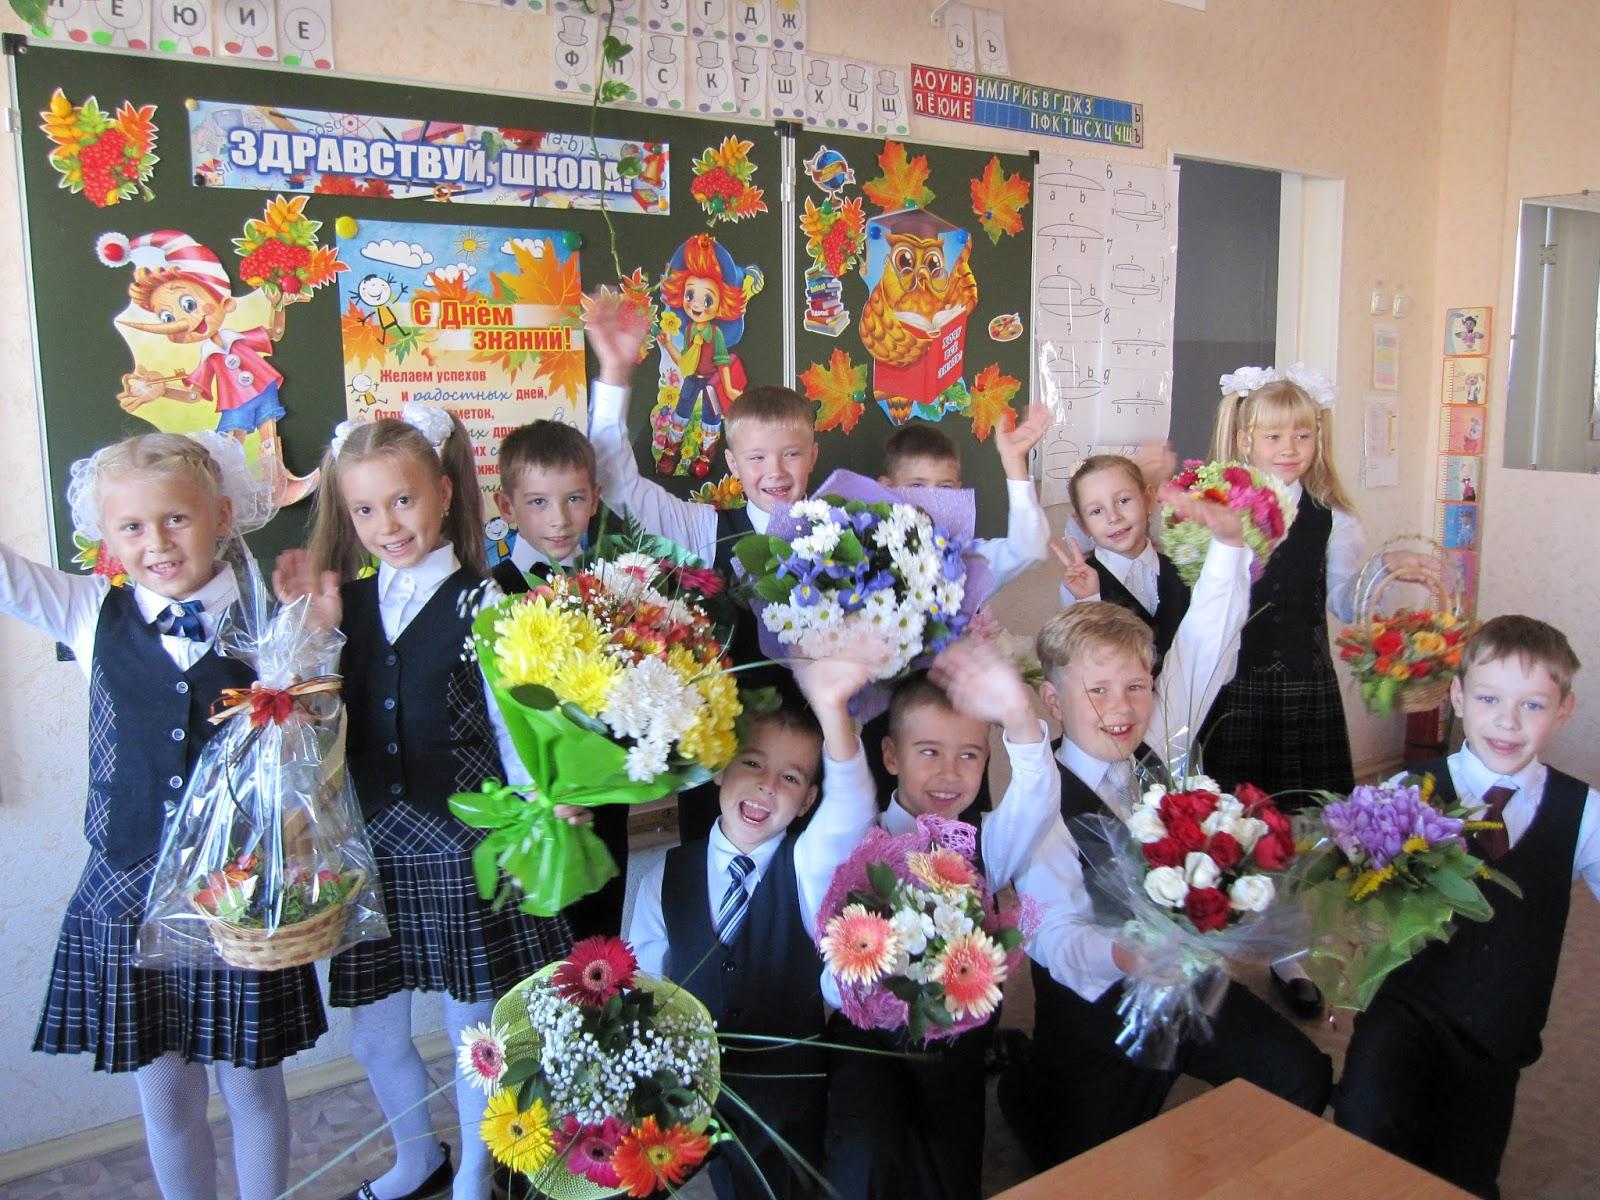 Сценарий школьного праздника на 1 сентября